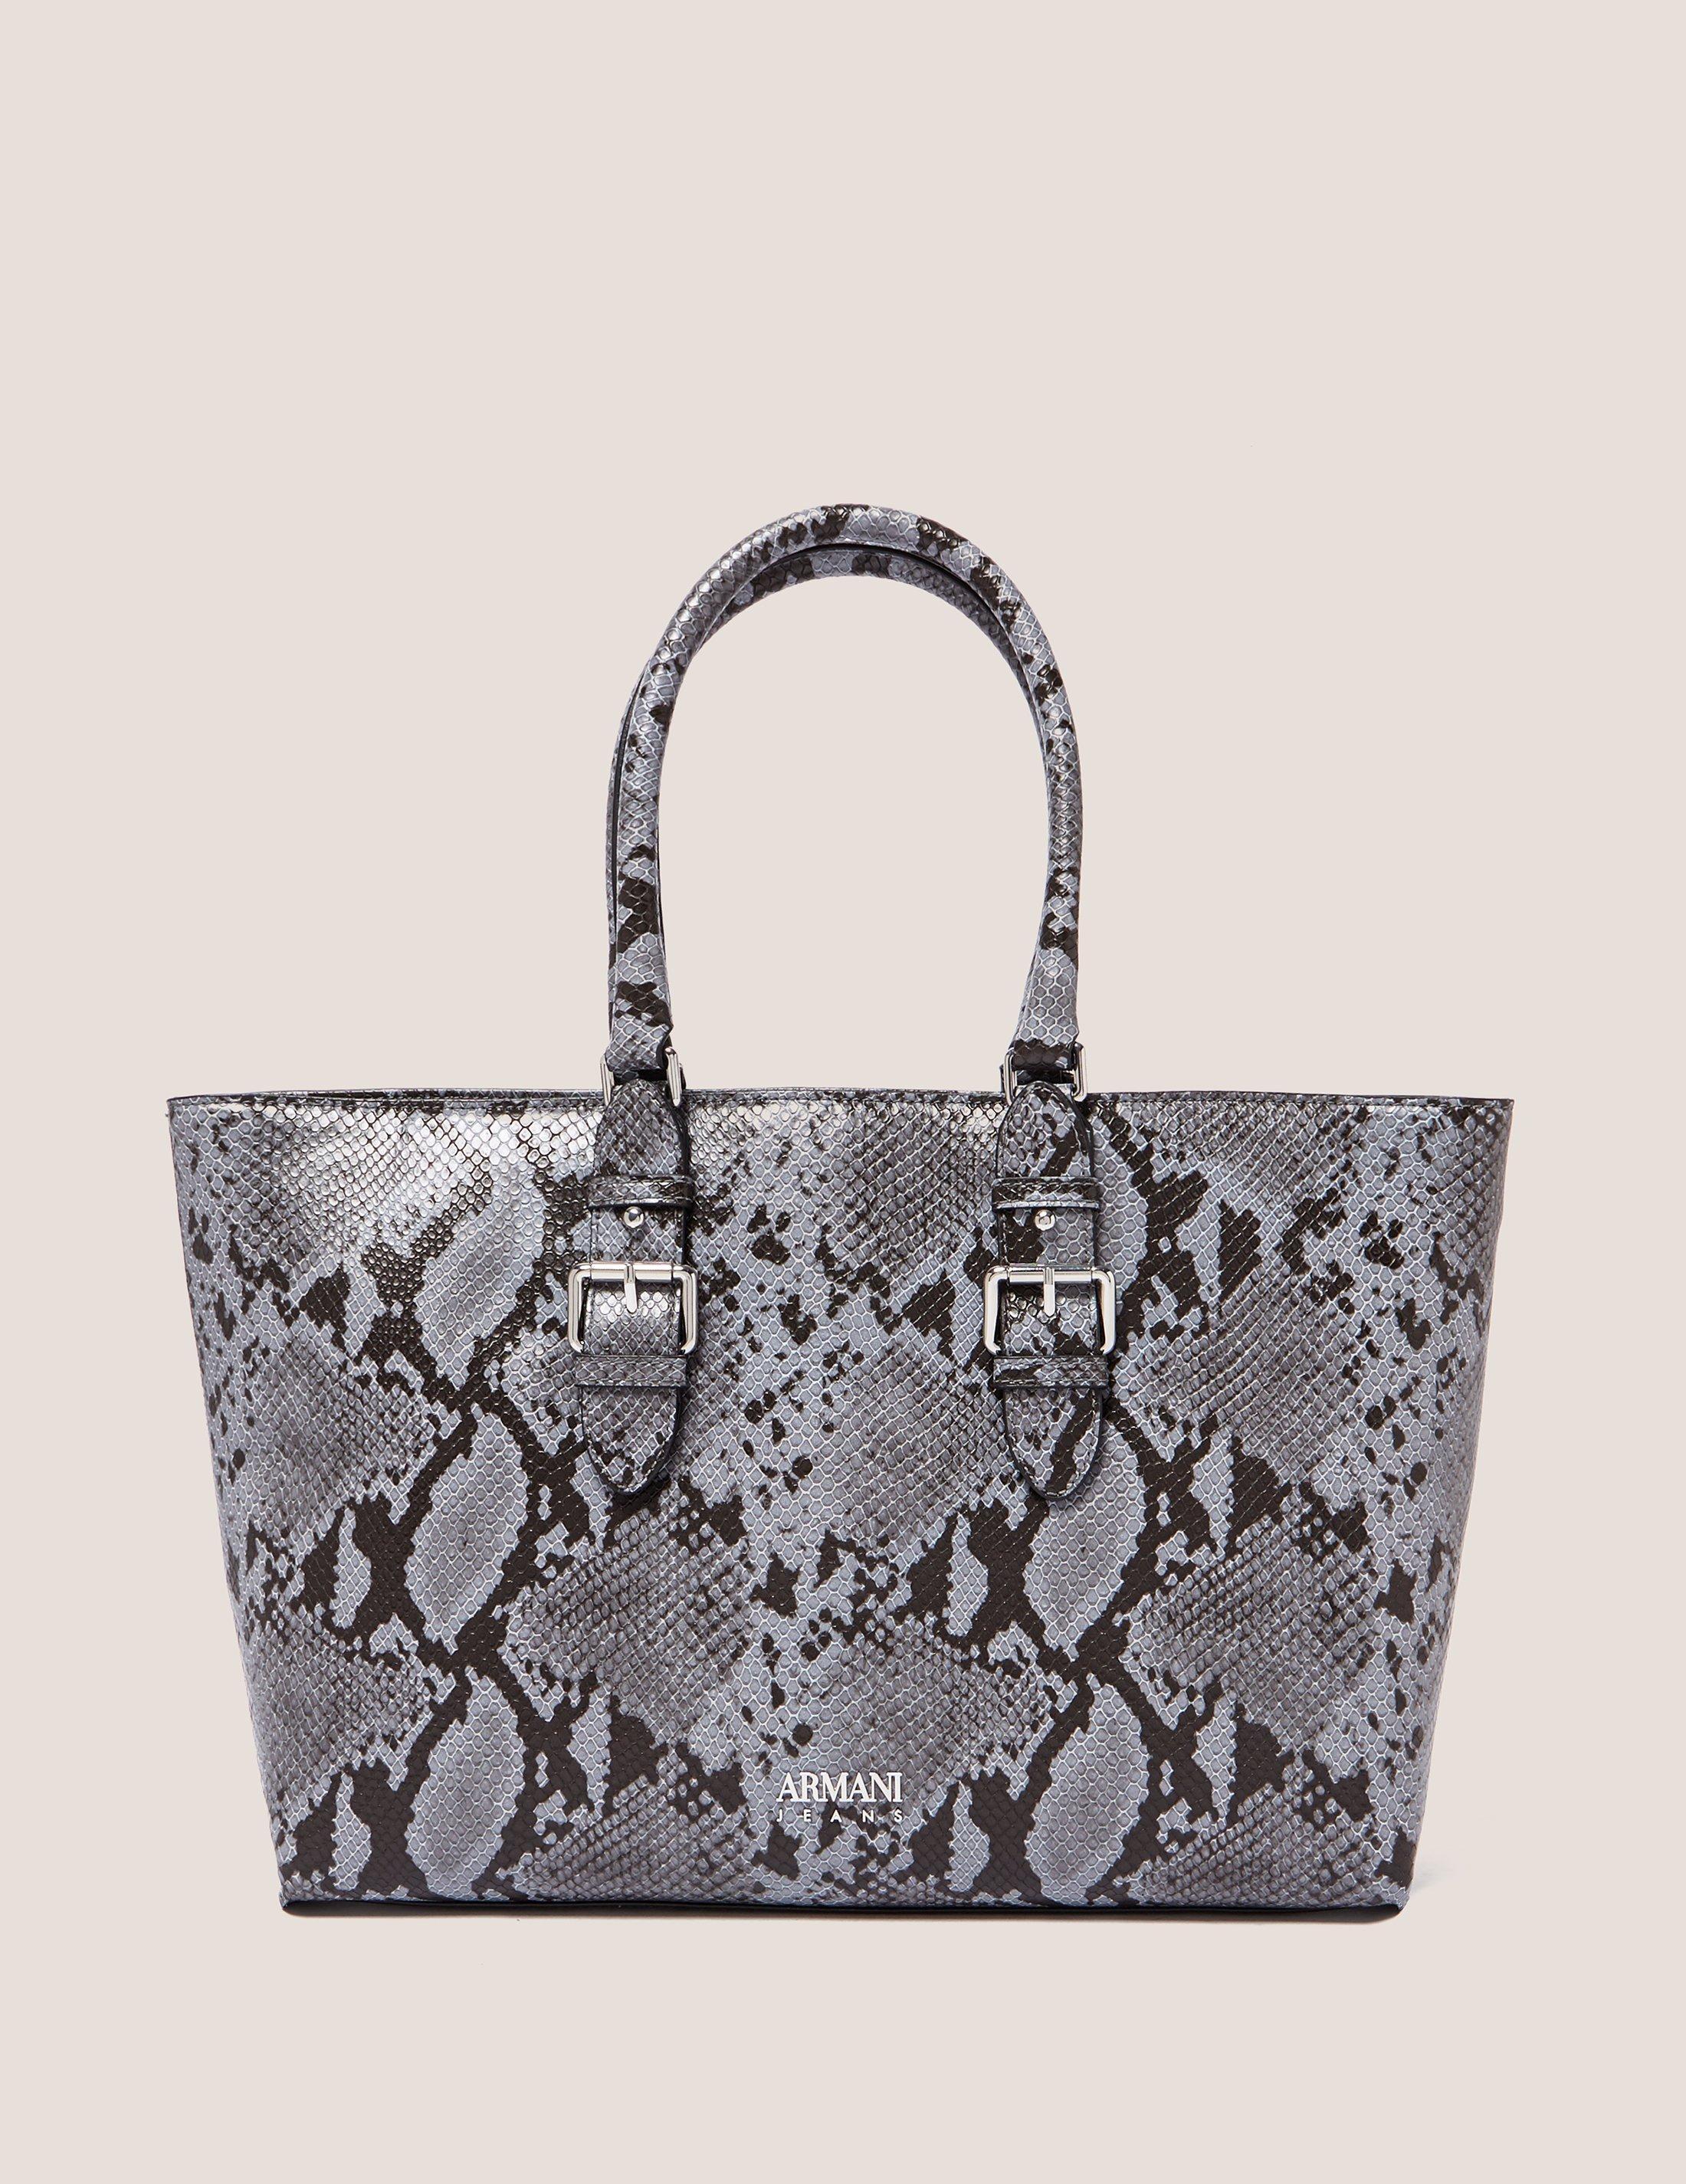 Lyst - Armani Jeans Snakeskin Shopper Bag in Gray 2700a63b4f0fa